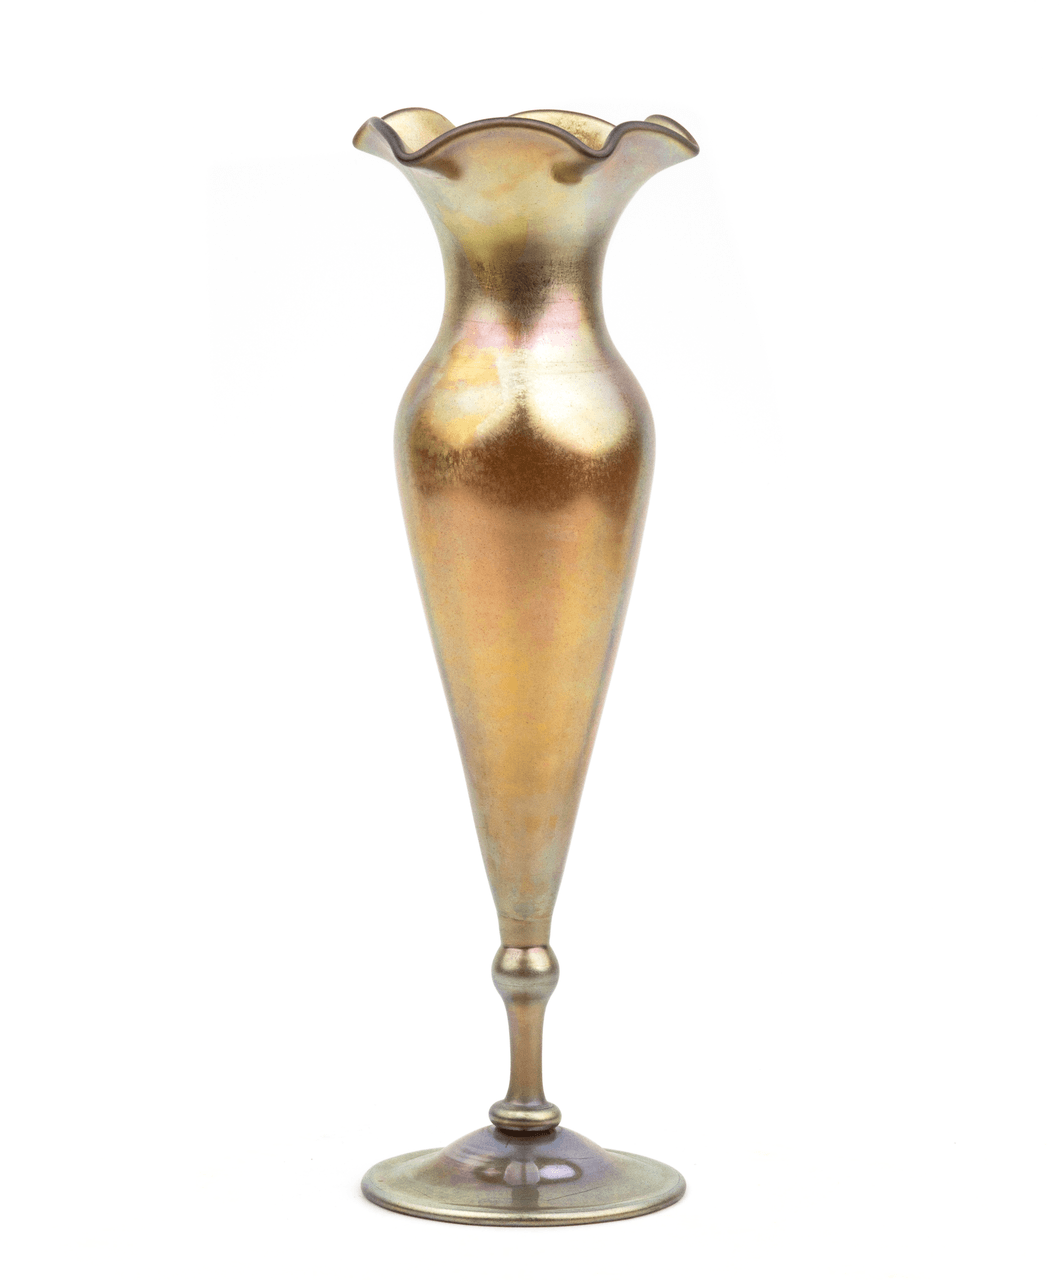 An Antique Steuben Art Glass Aurene Glass Footed Floriform Vase